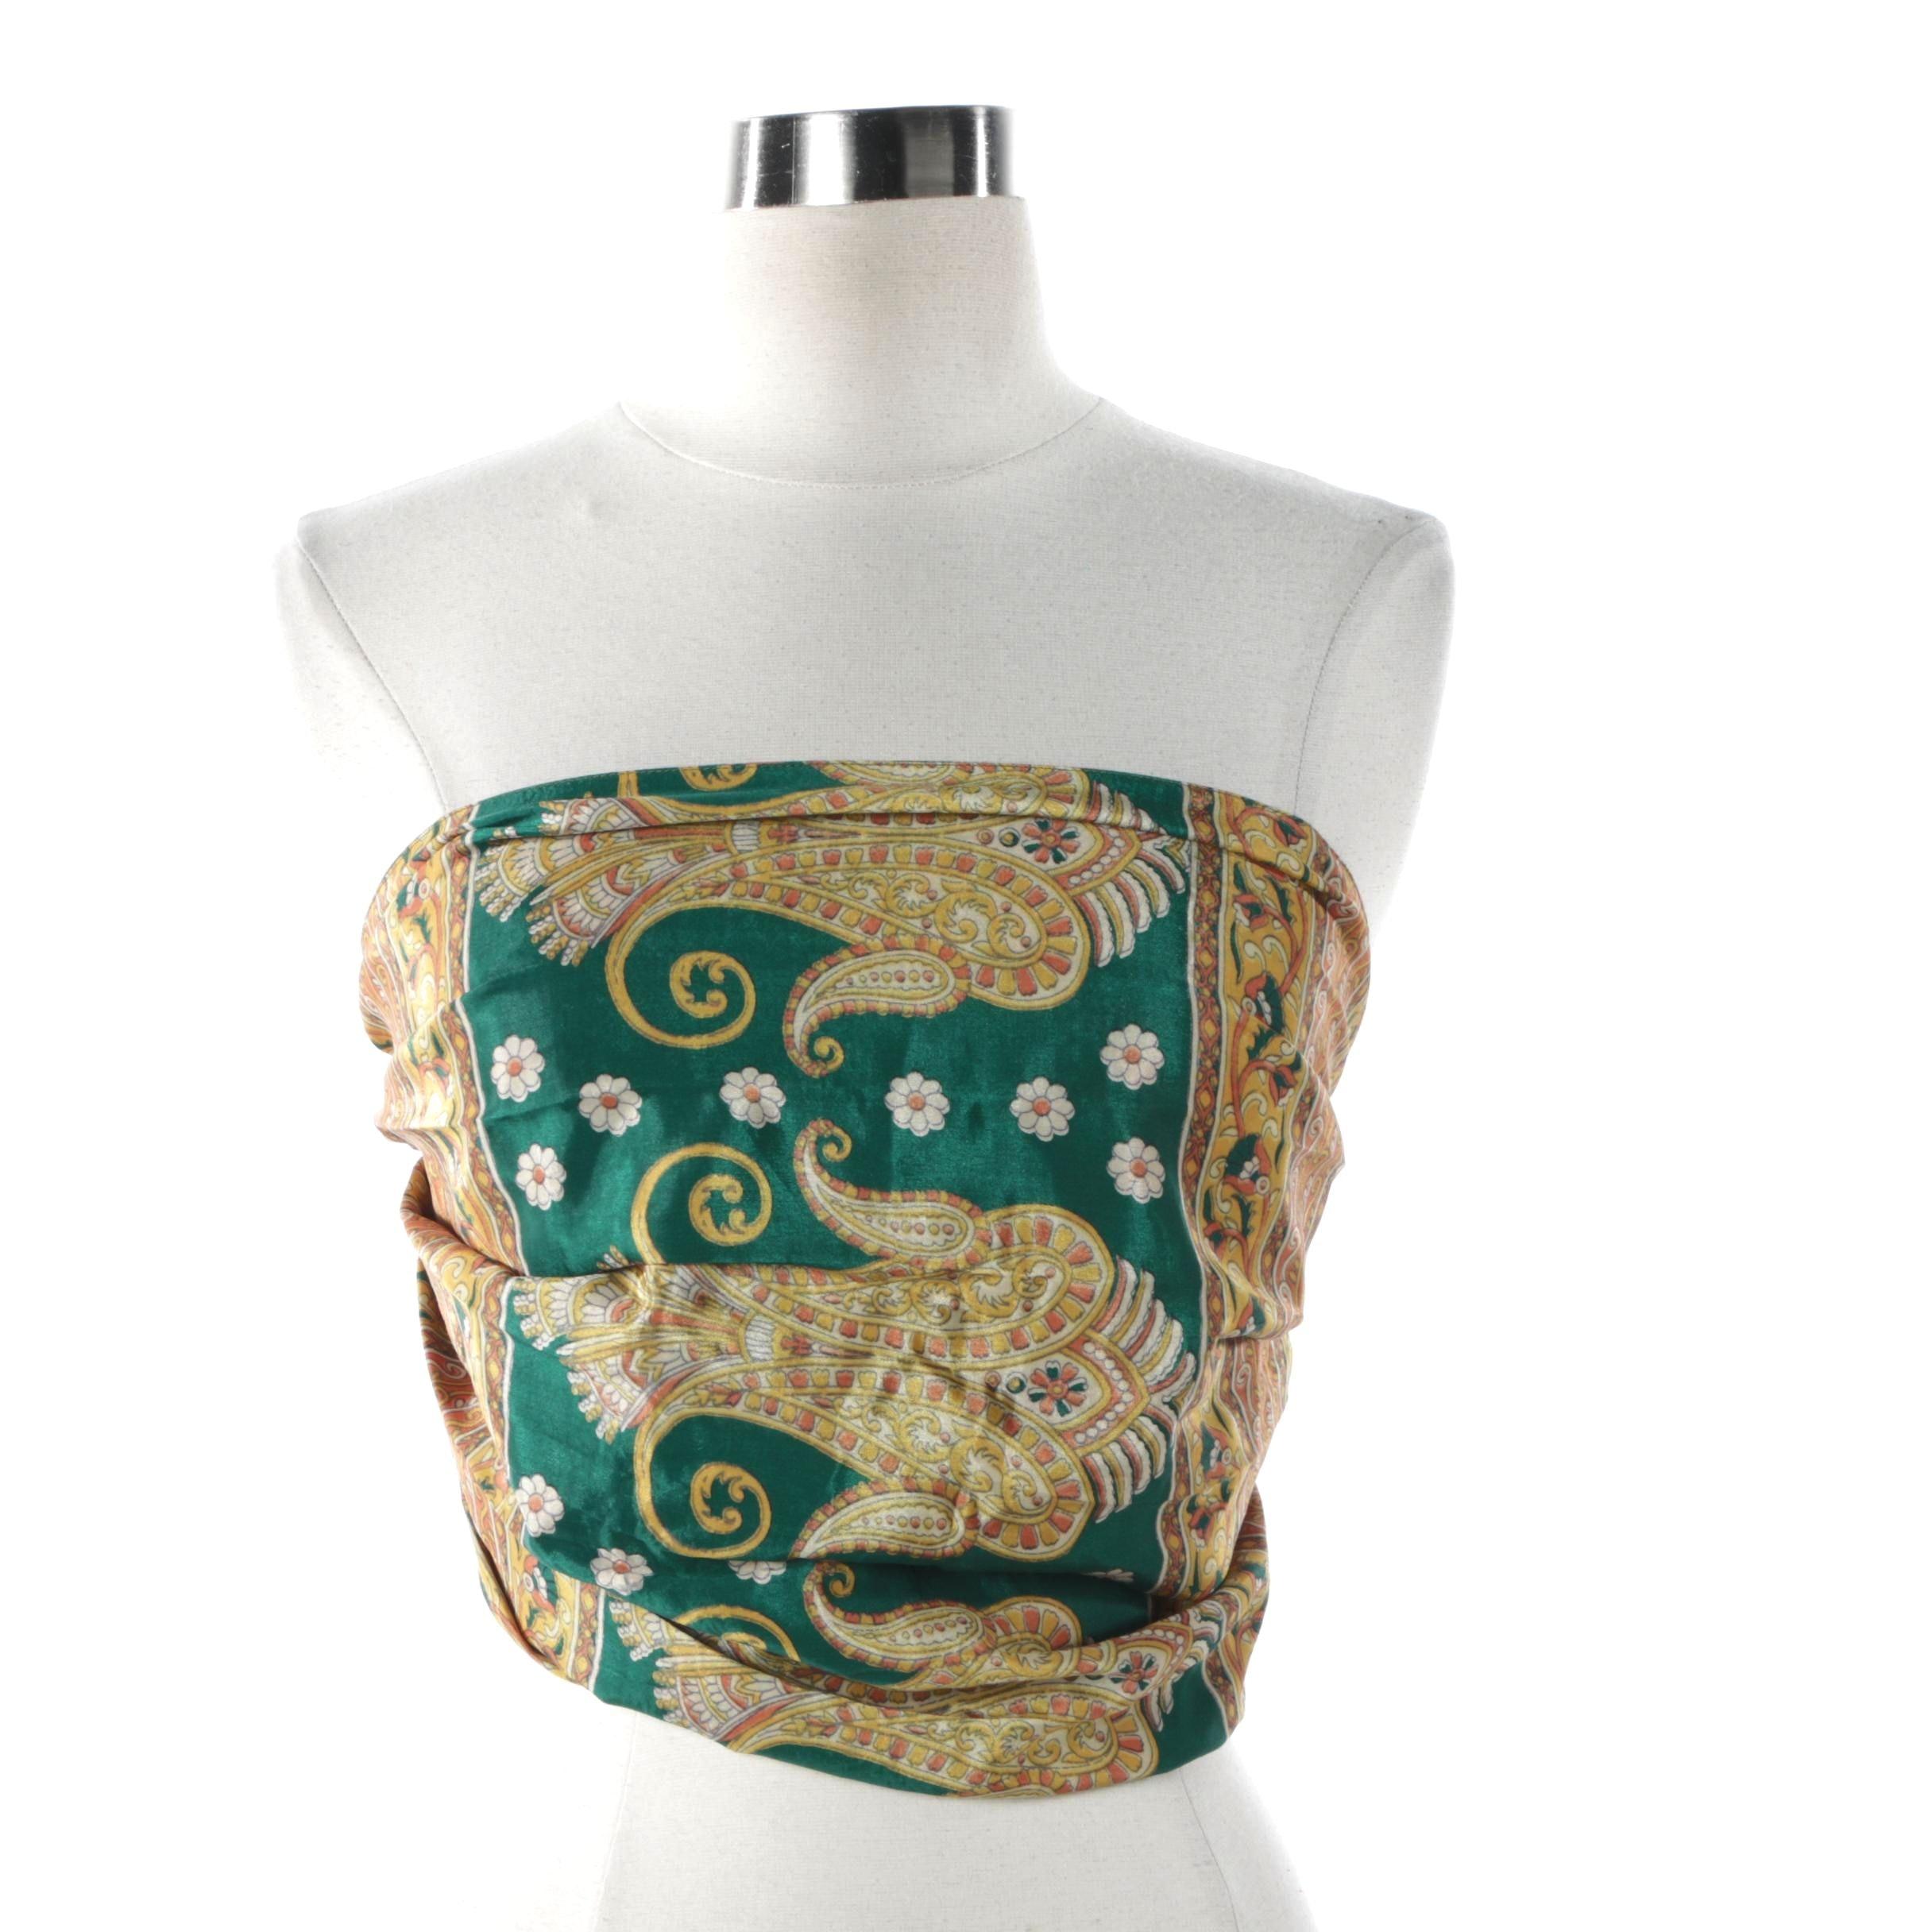 Green and Nutmeg Vintage Sari One of a Kind Sari Scarf